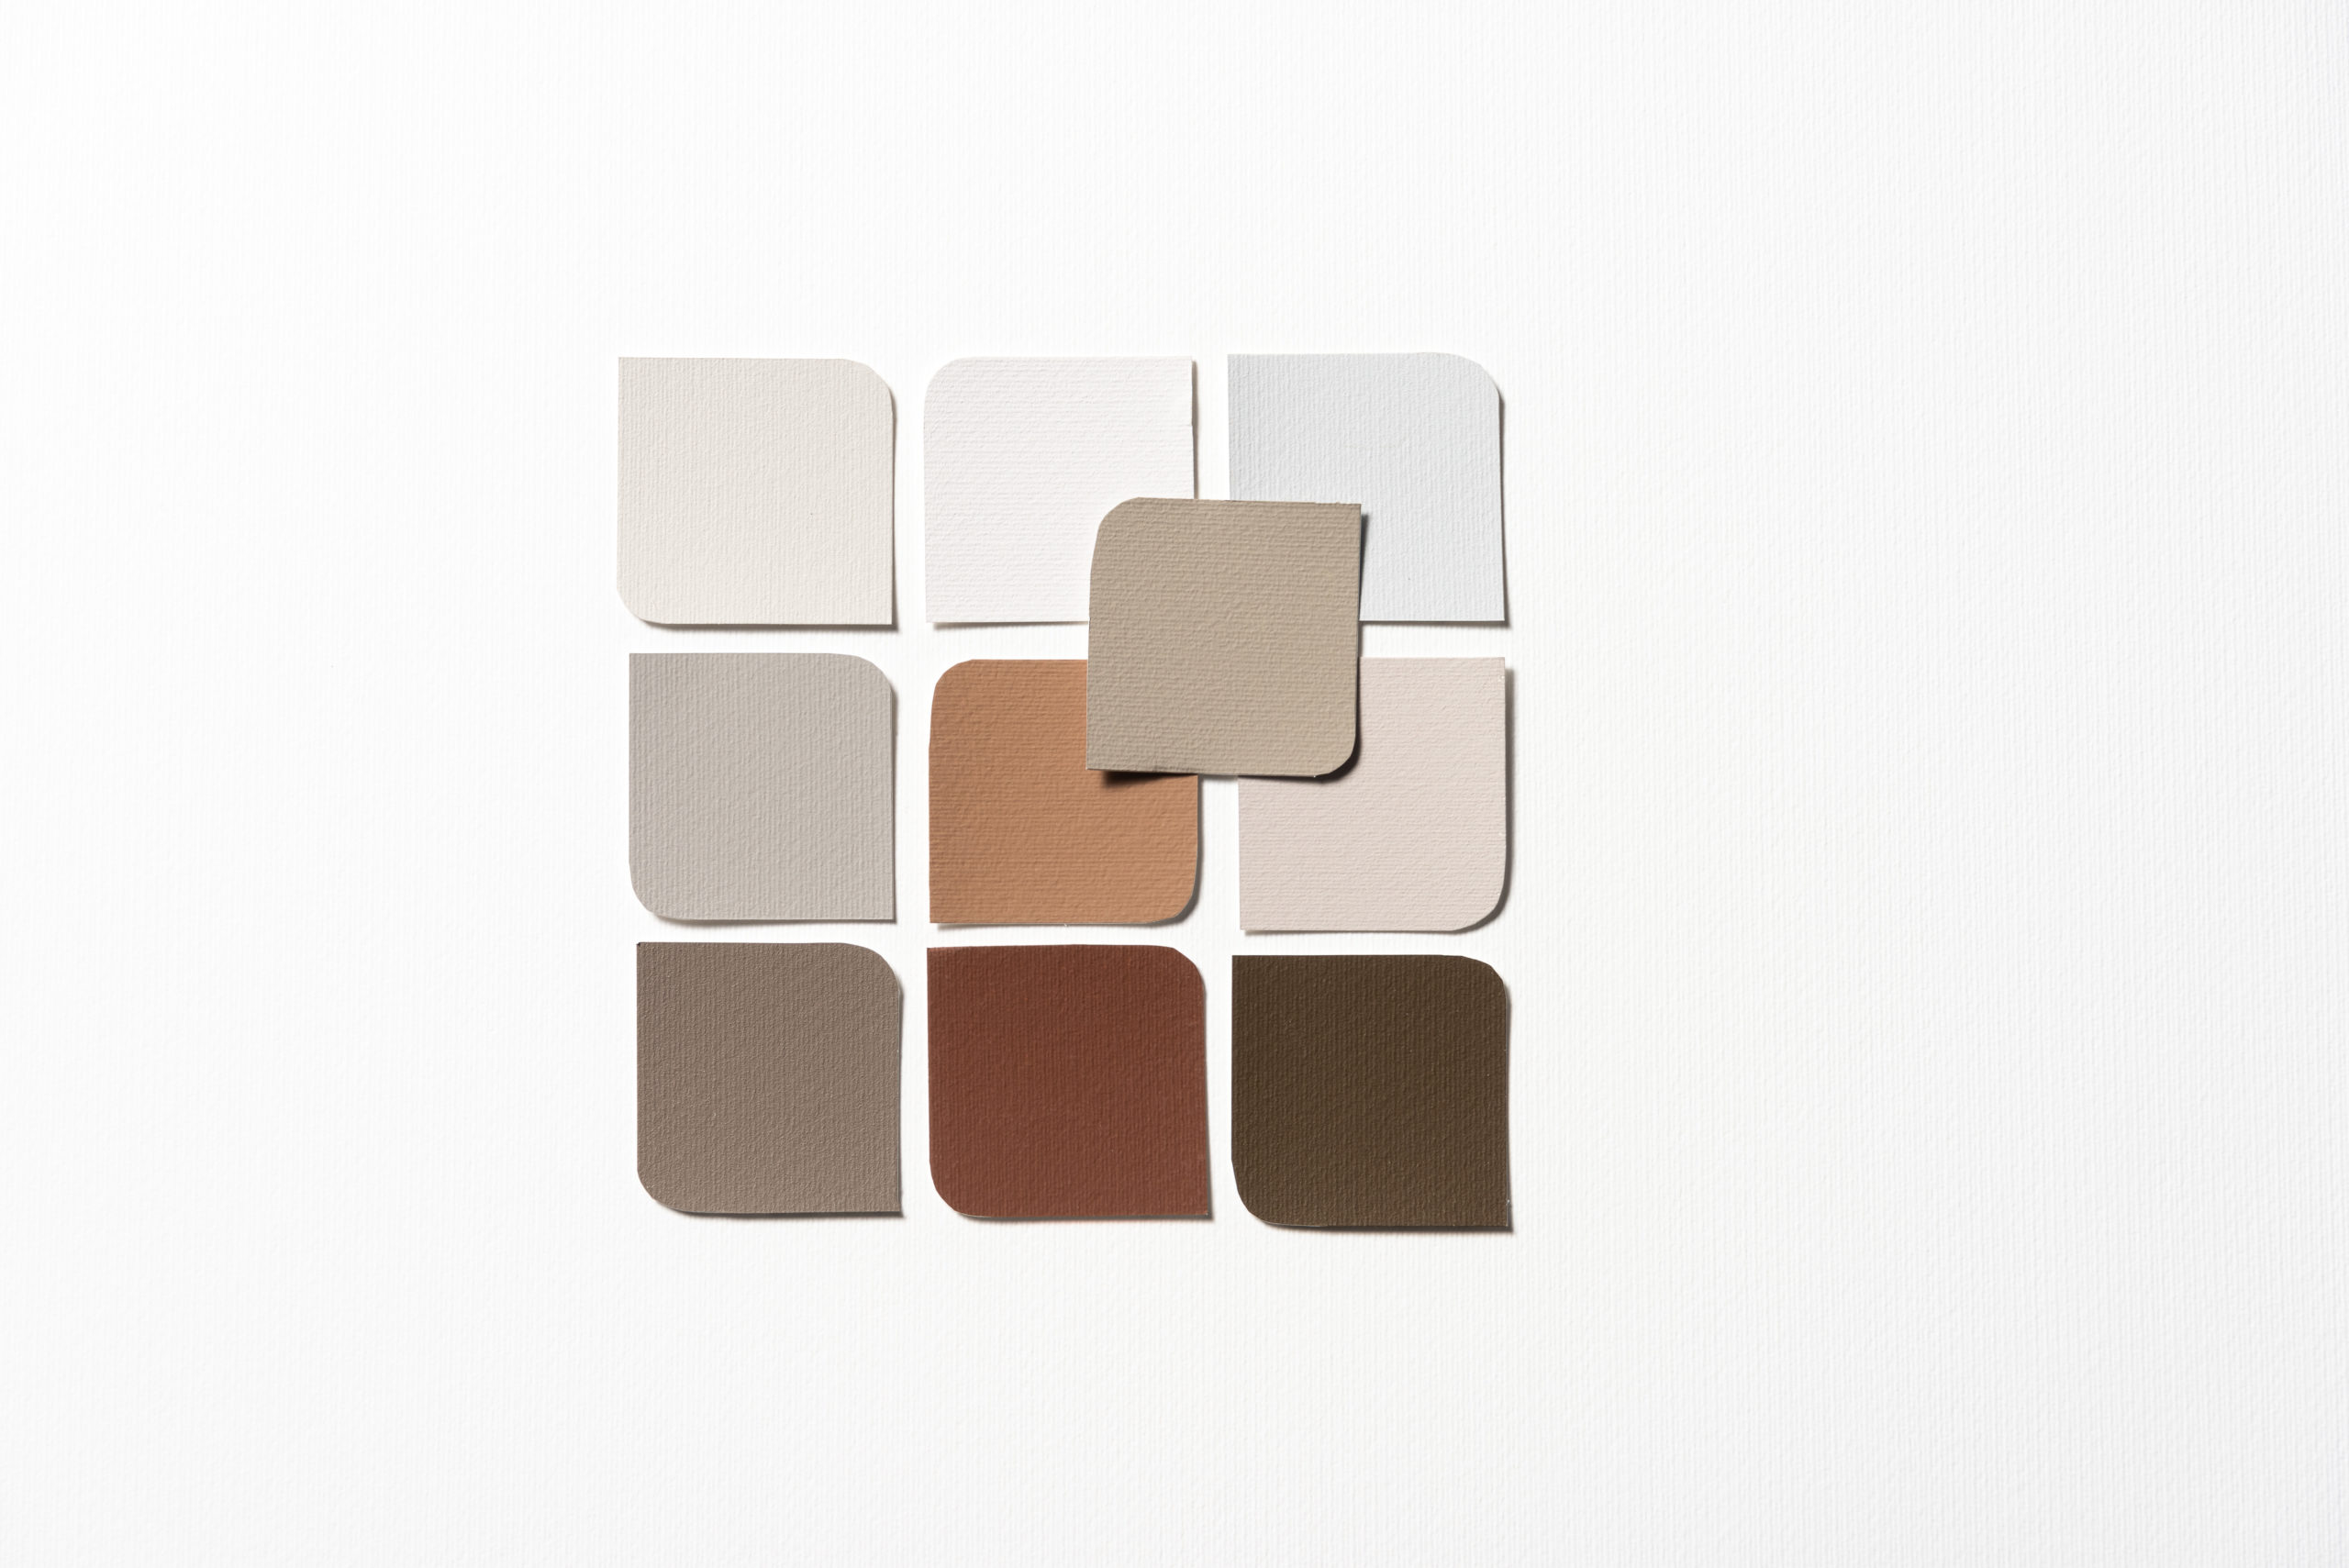 DULUX announces Colour of the Year 2021 - BRAVE GROUND - Trust Palette - 1